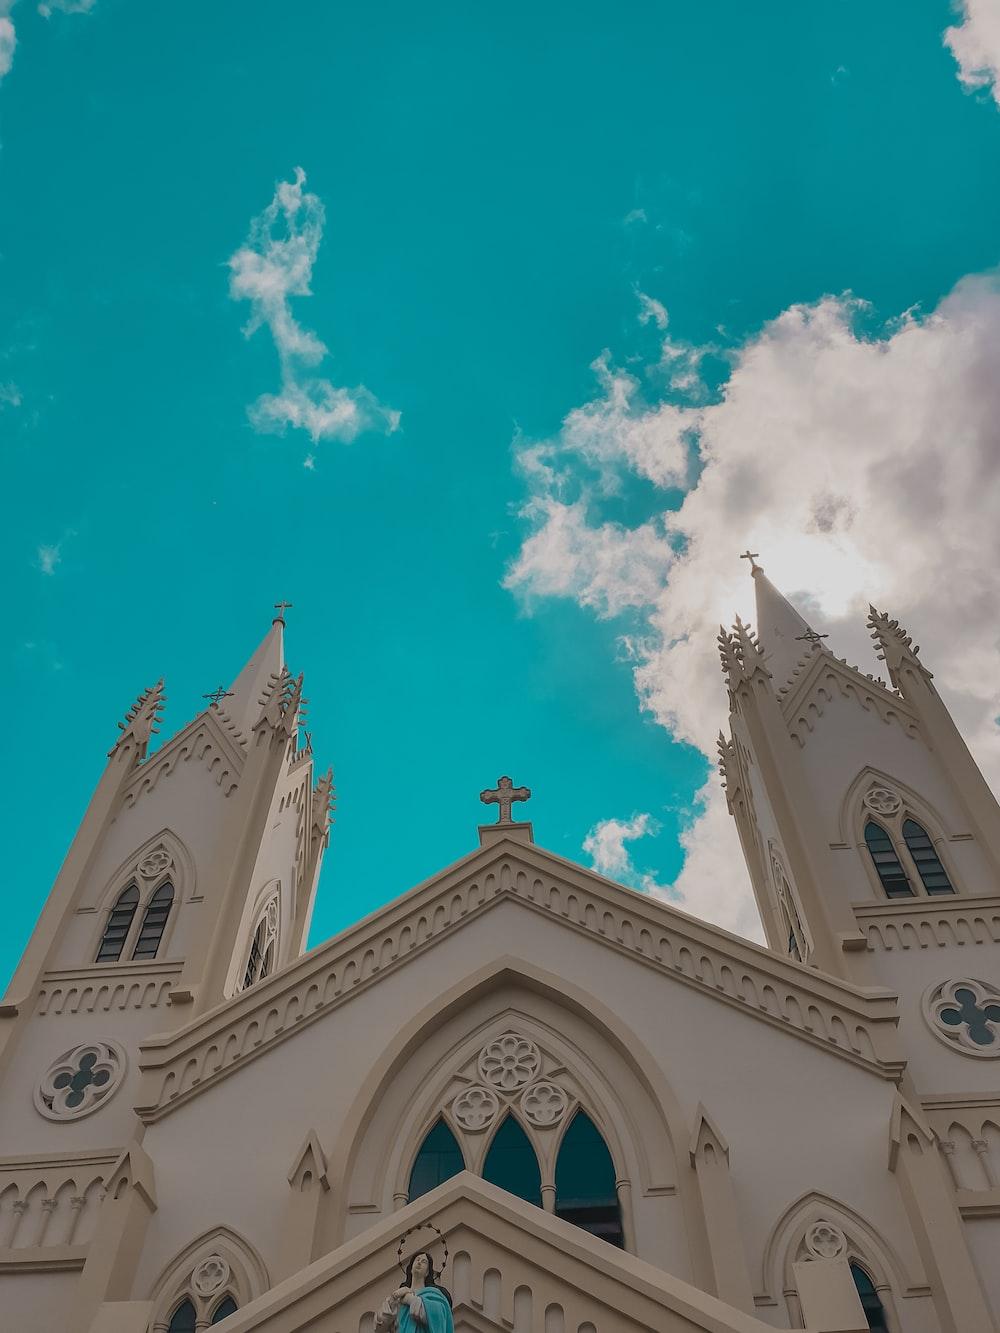 beige church